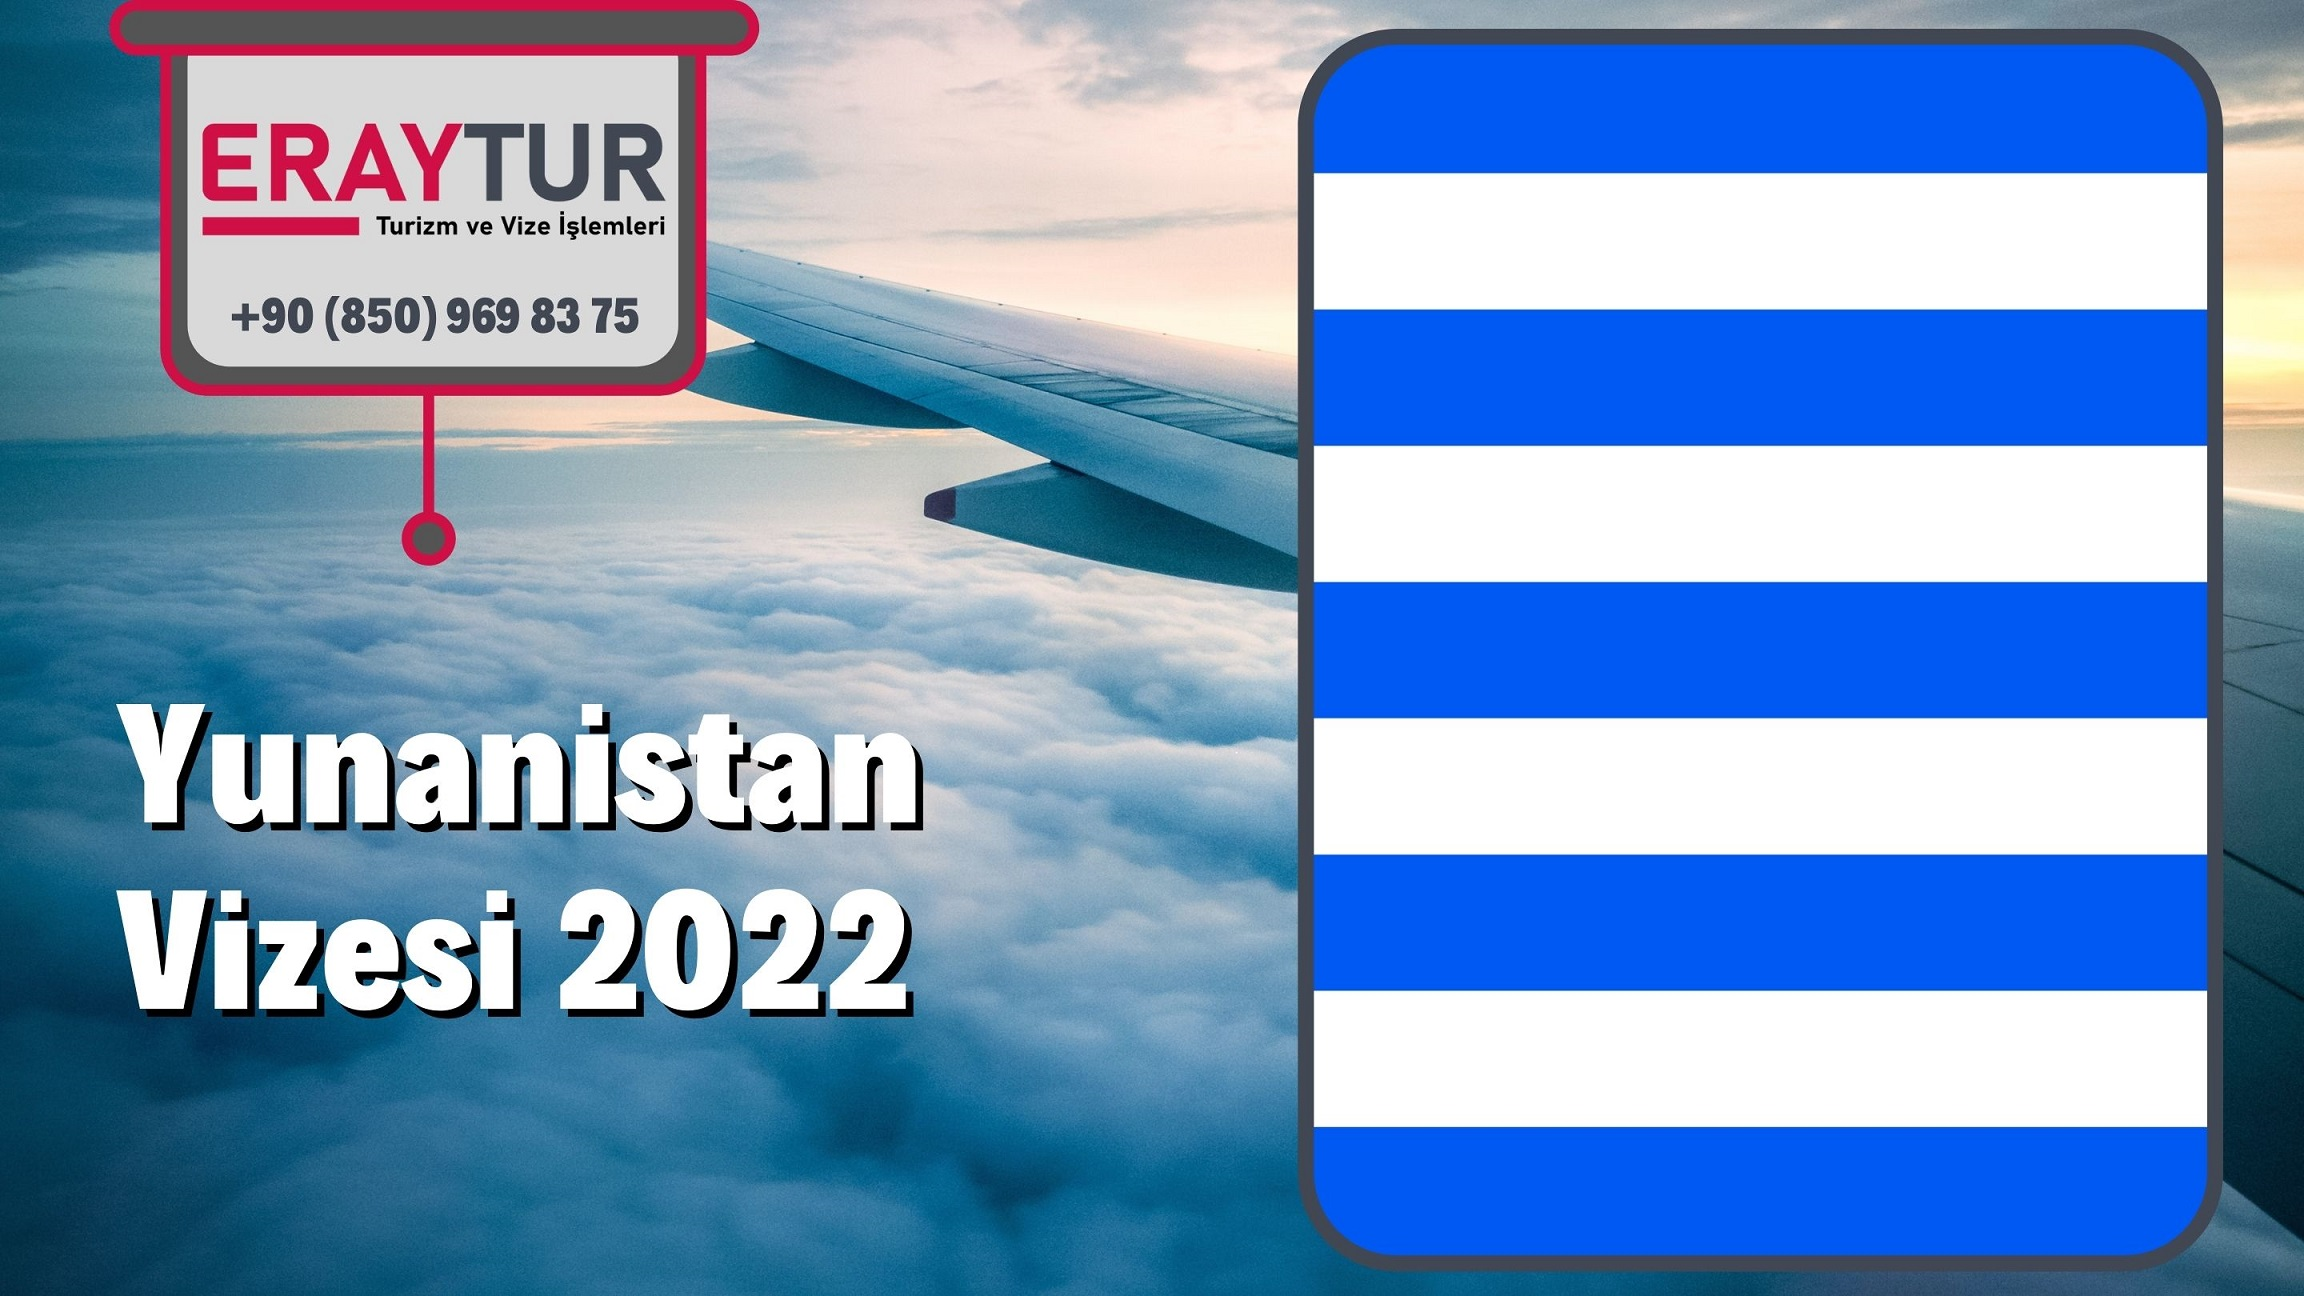 Yunanistan Vizesi 2022 1 – yunanistan vizesi 2022 2